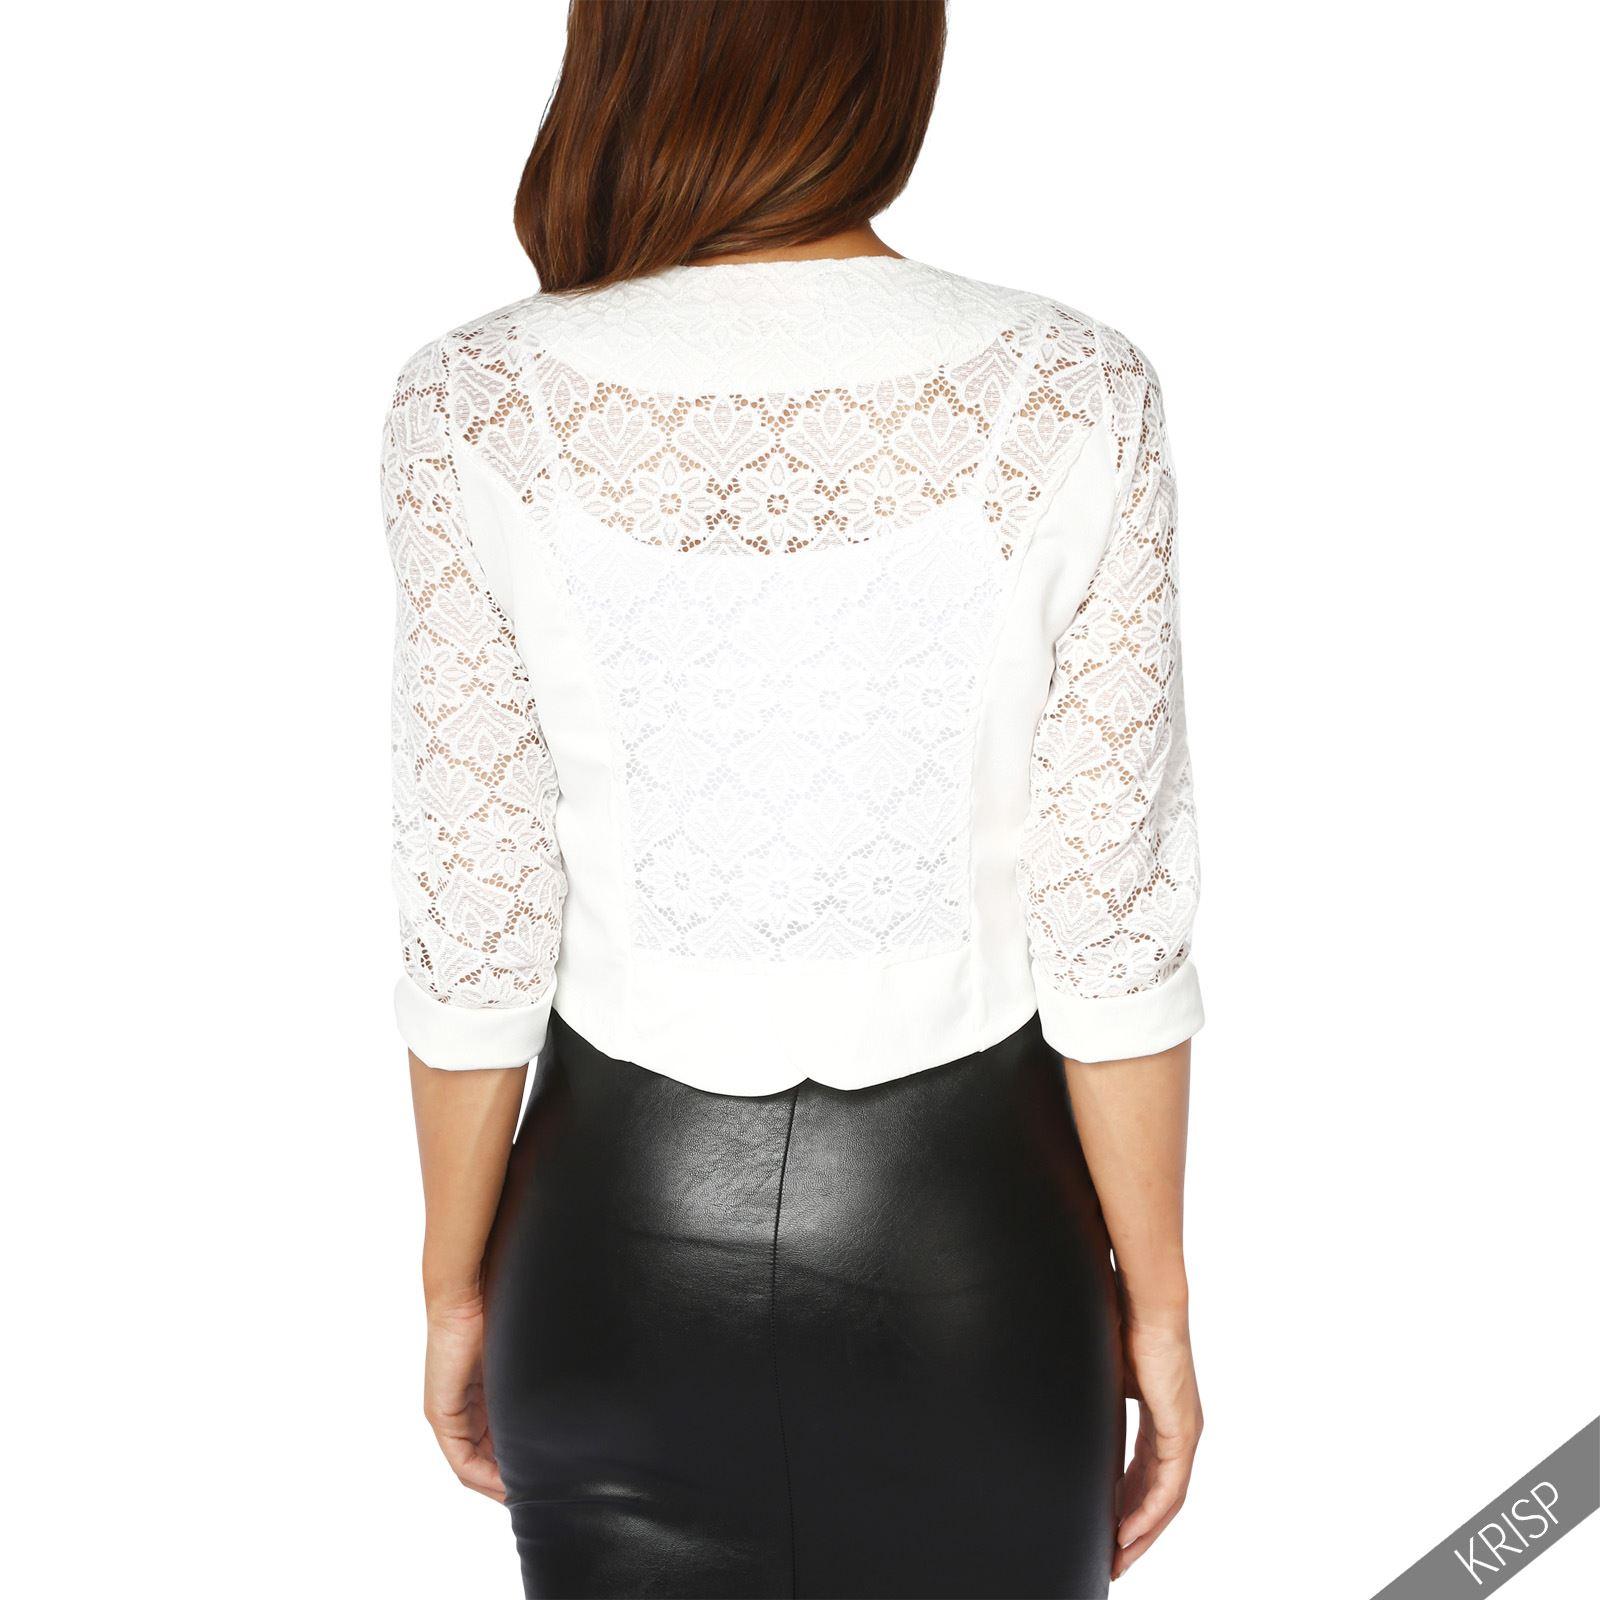 Womens-Ladies-Bolero-Lace-Shrug-Short-Sleeve-Cardigan-Cropped-Party-Top-Jacket thumbnail 24